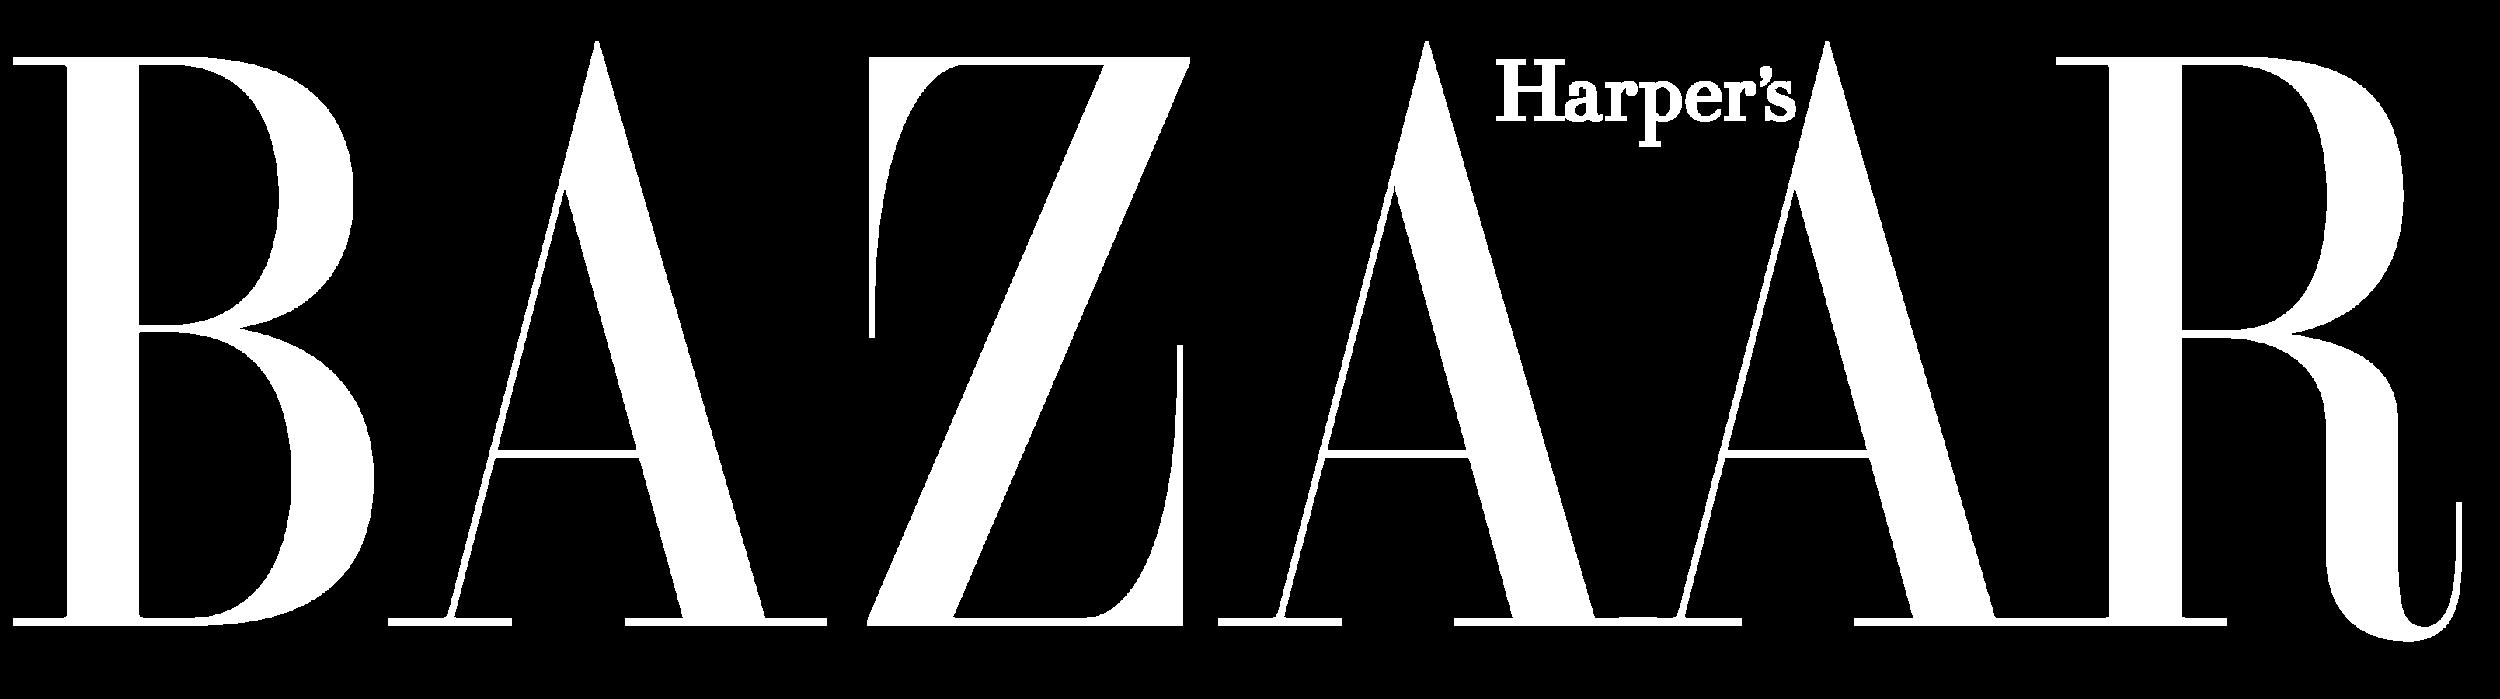 Harpers_Bazaar_logo-white.png